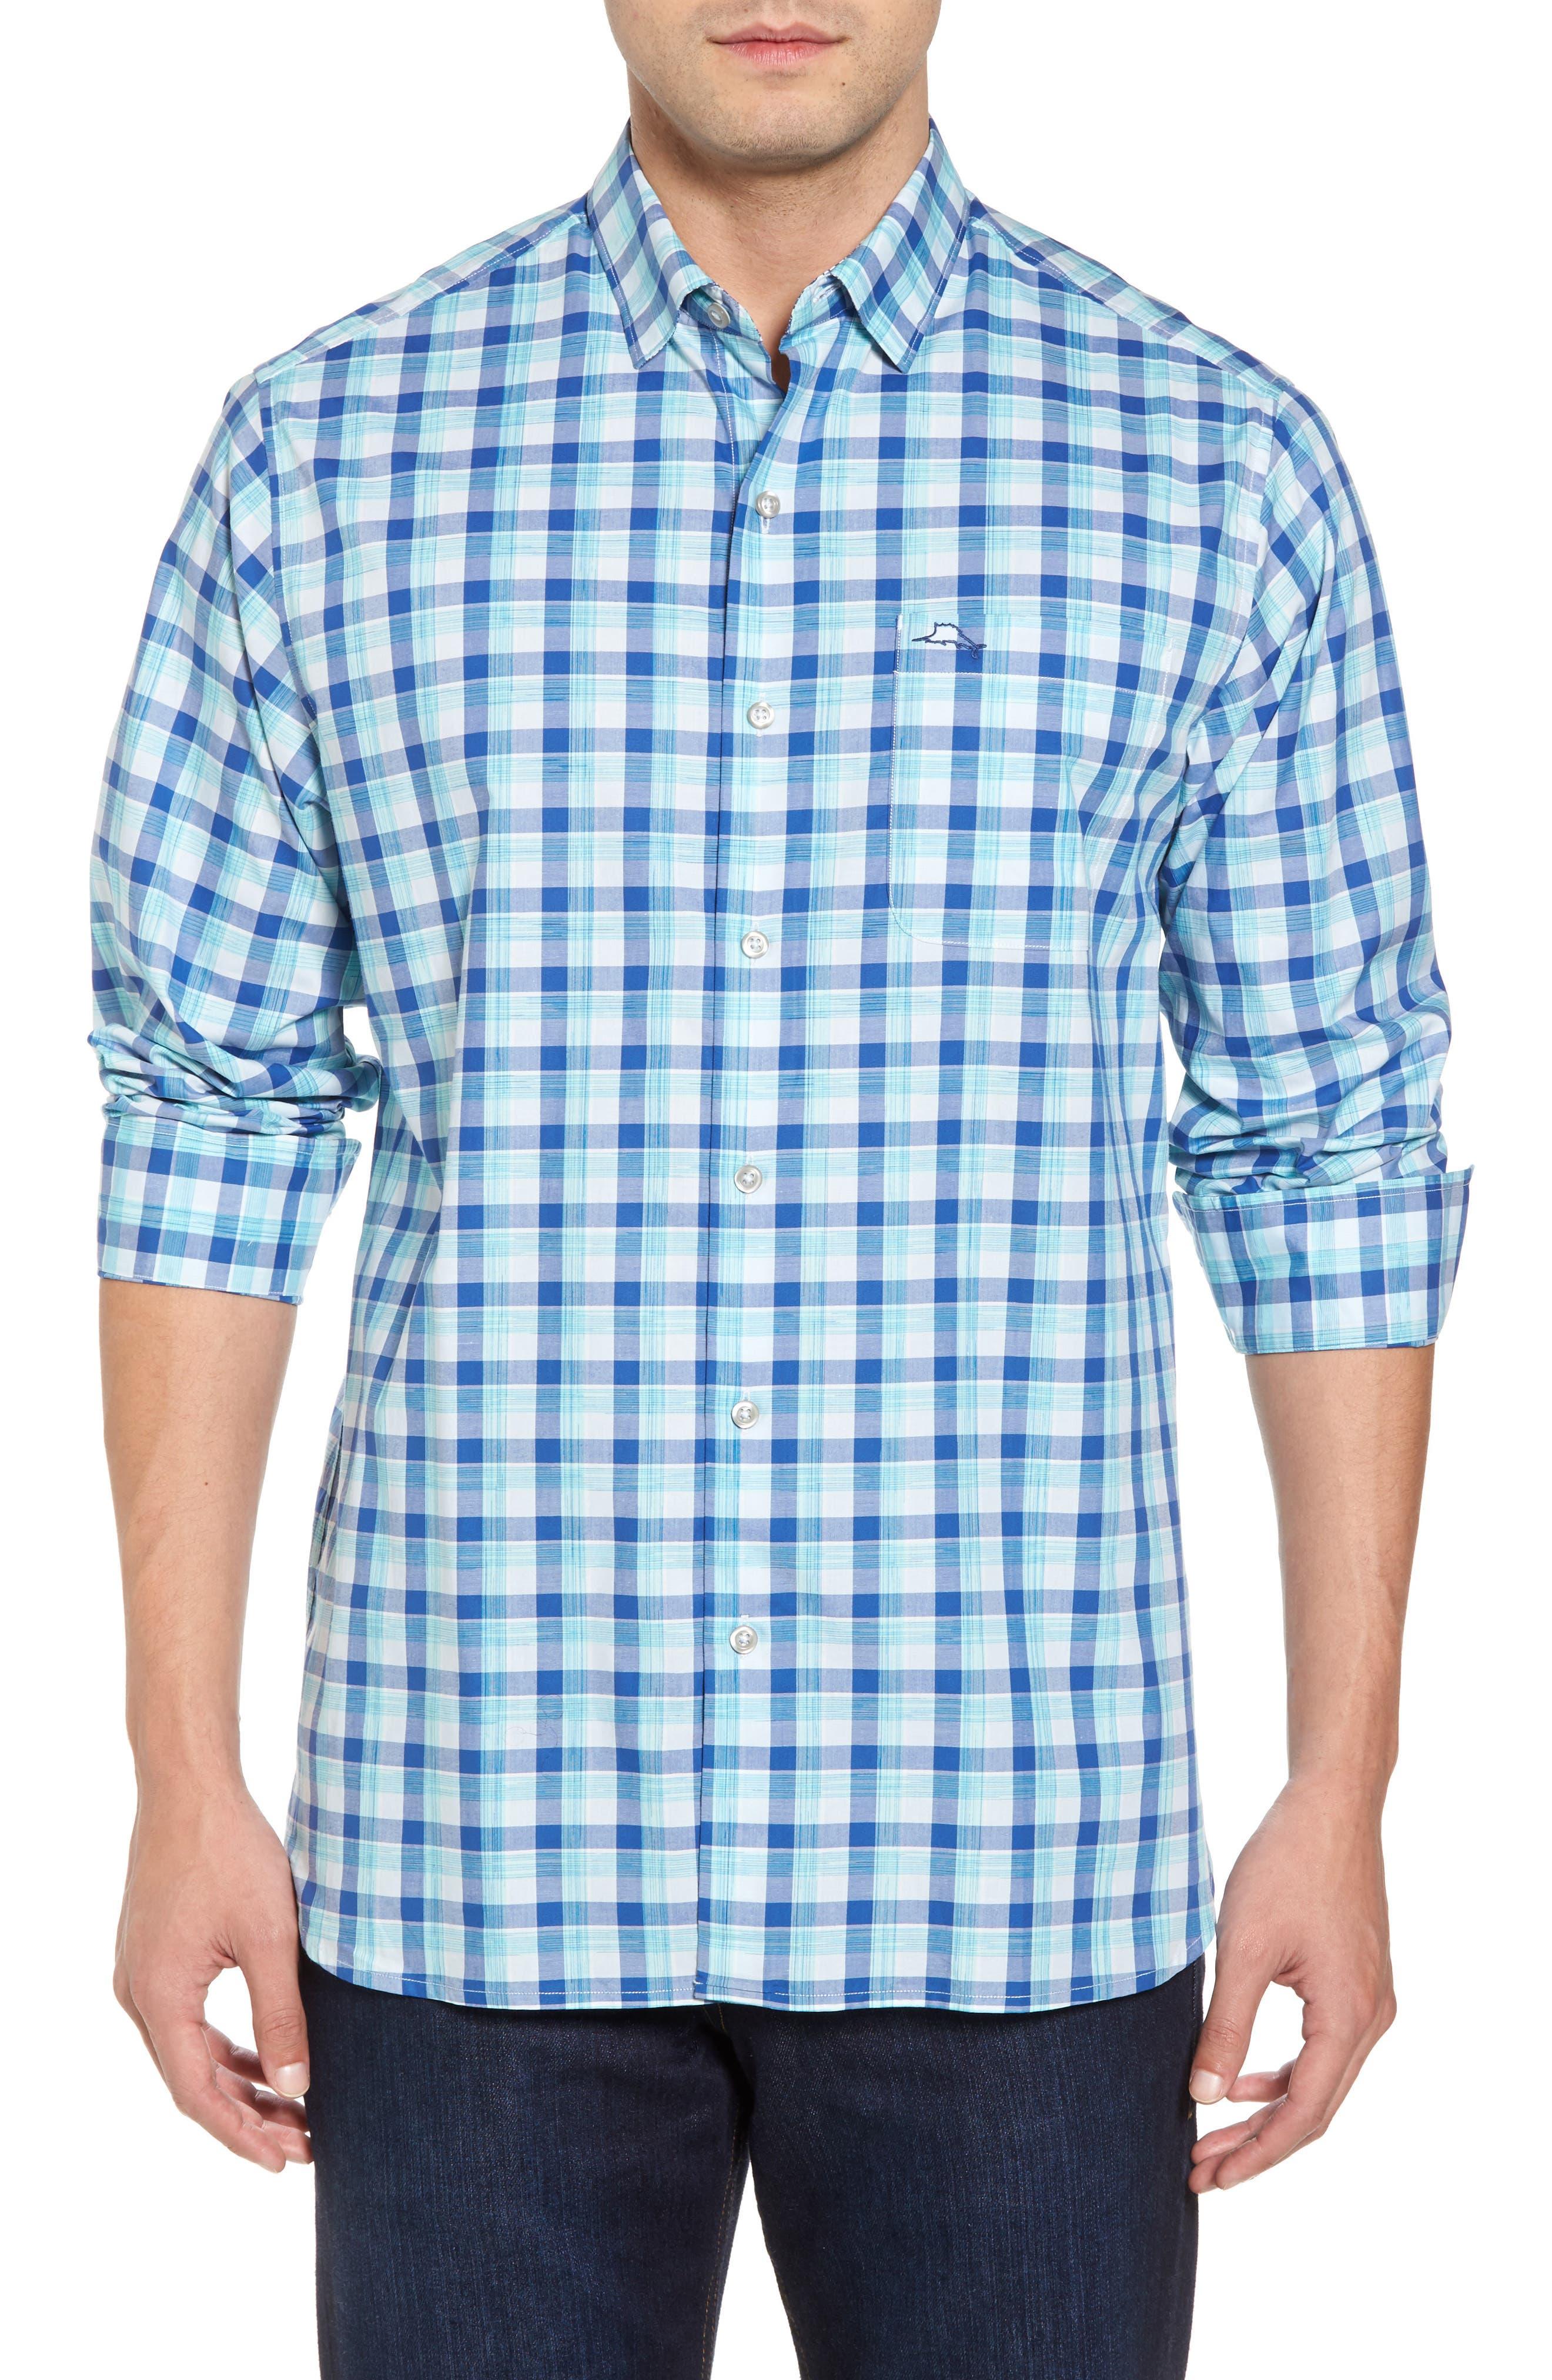 Main Image - Tommy Bahama Atlantic Tides Regular Fit Plaid Sport Shirt